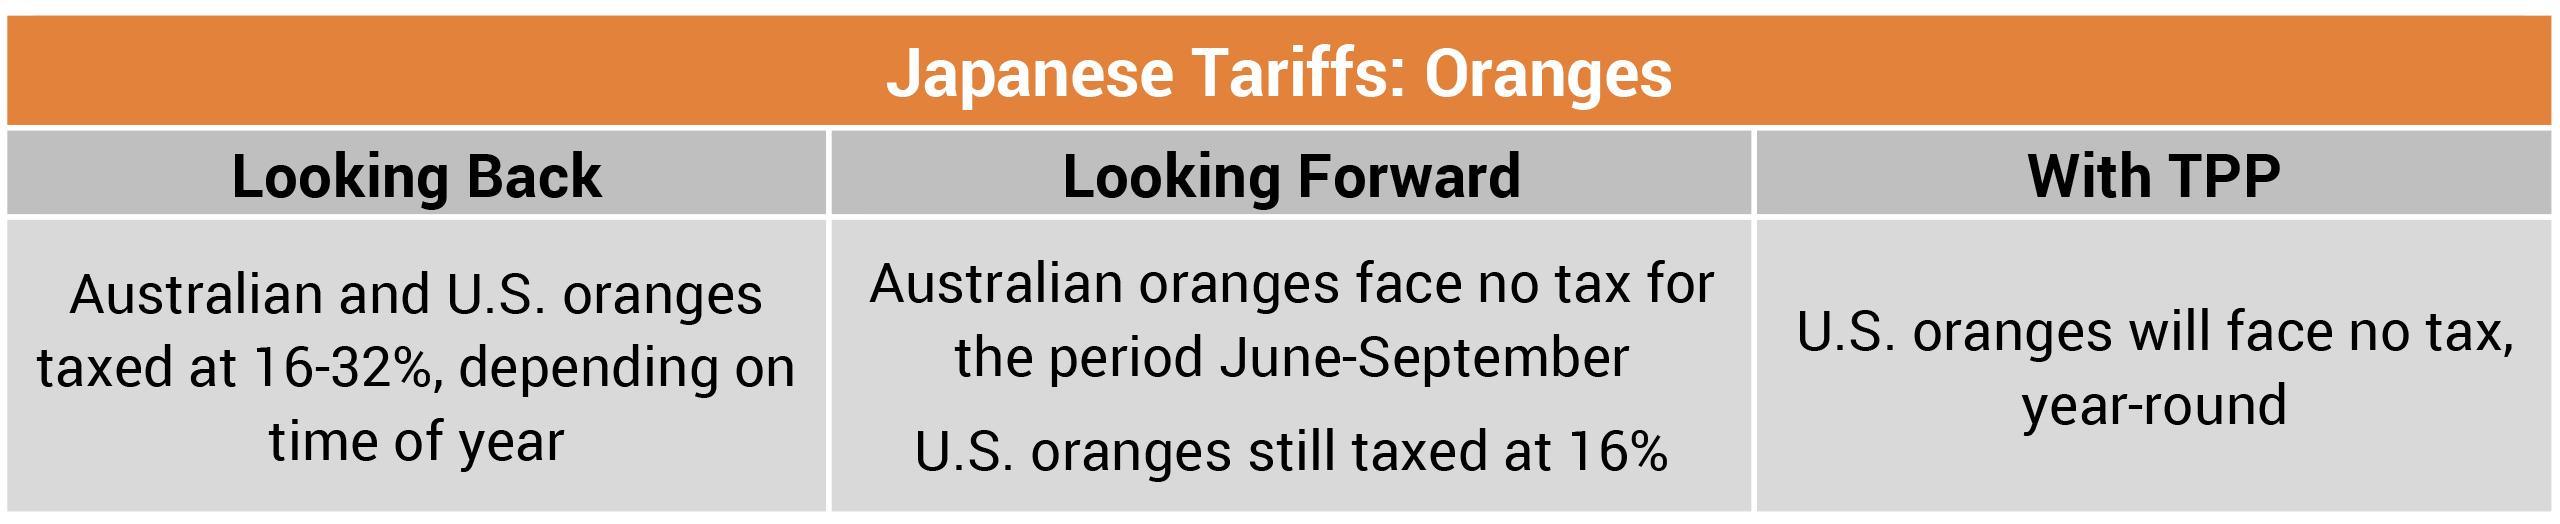 Japanese Tariffs Oranges